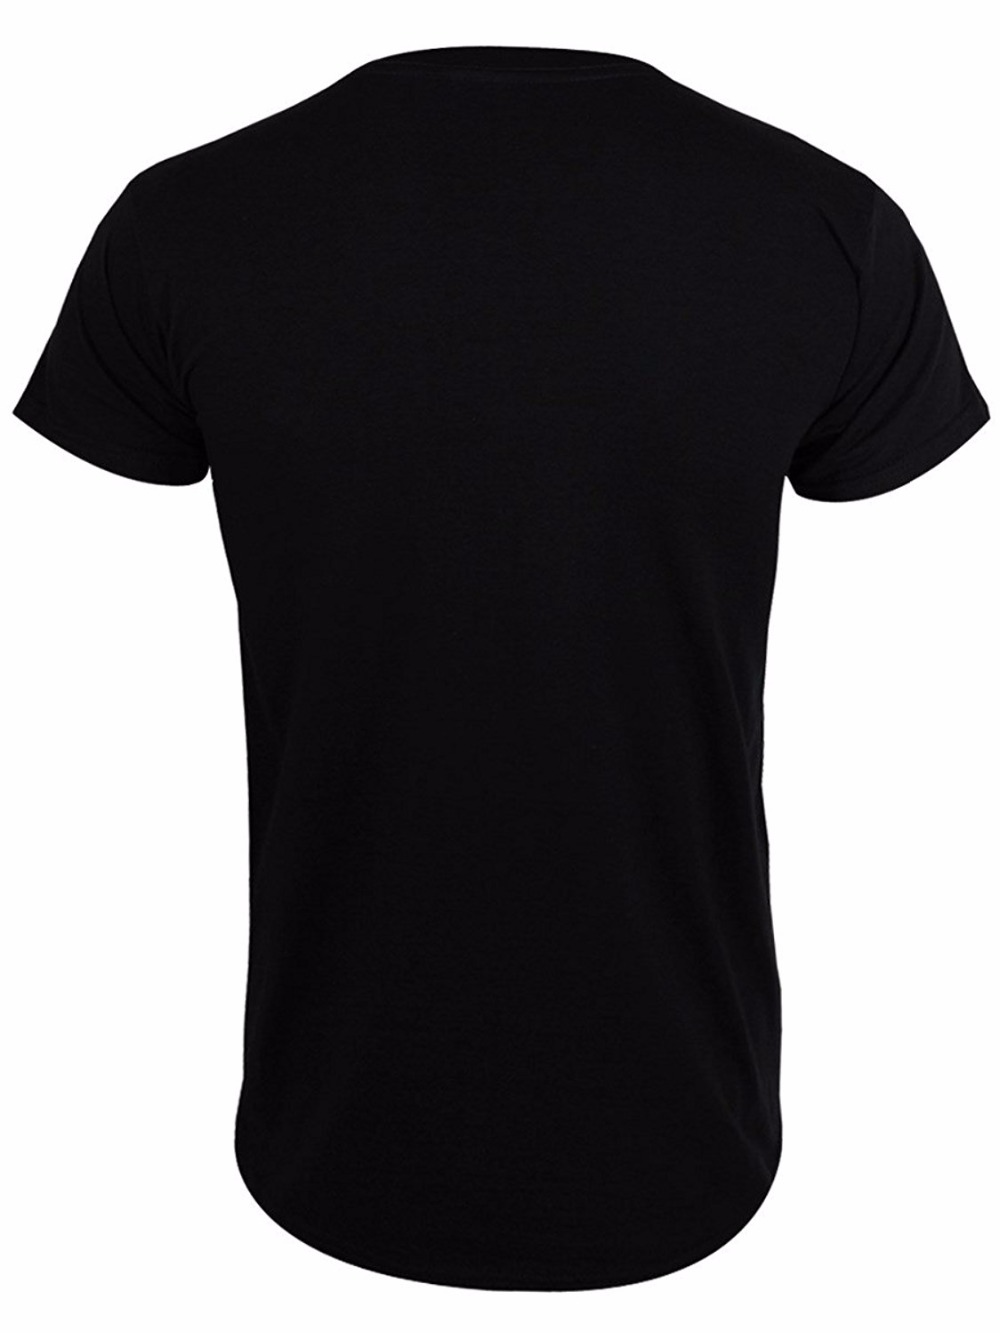 Cool Shirt Designs Mens Vale Of Shadows T Shirt Black Mens Crew